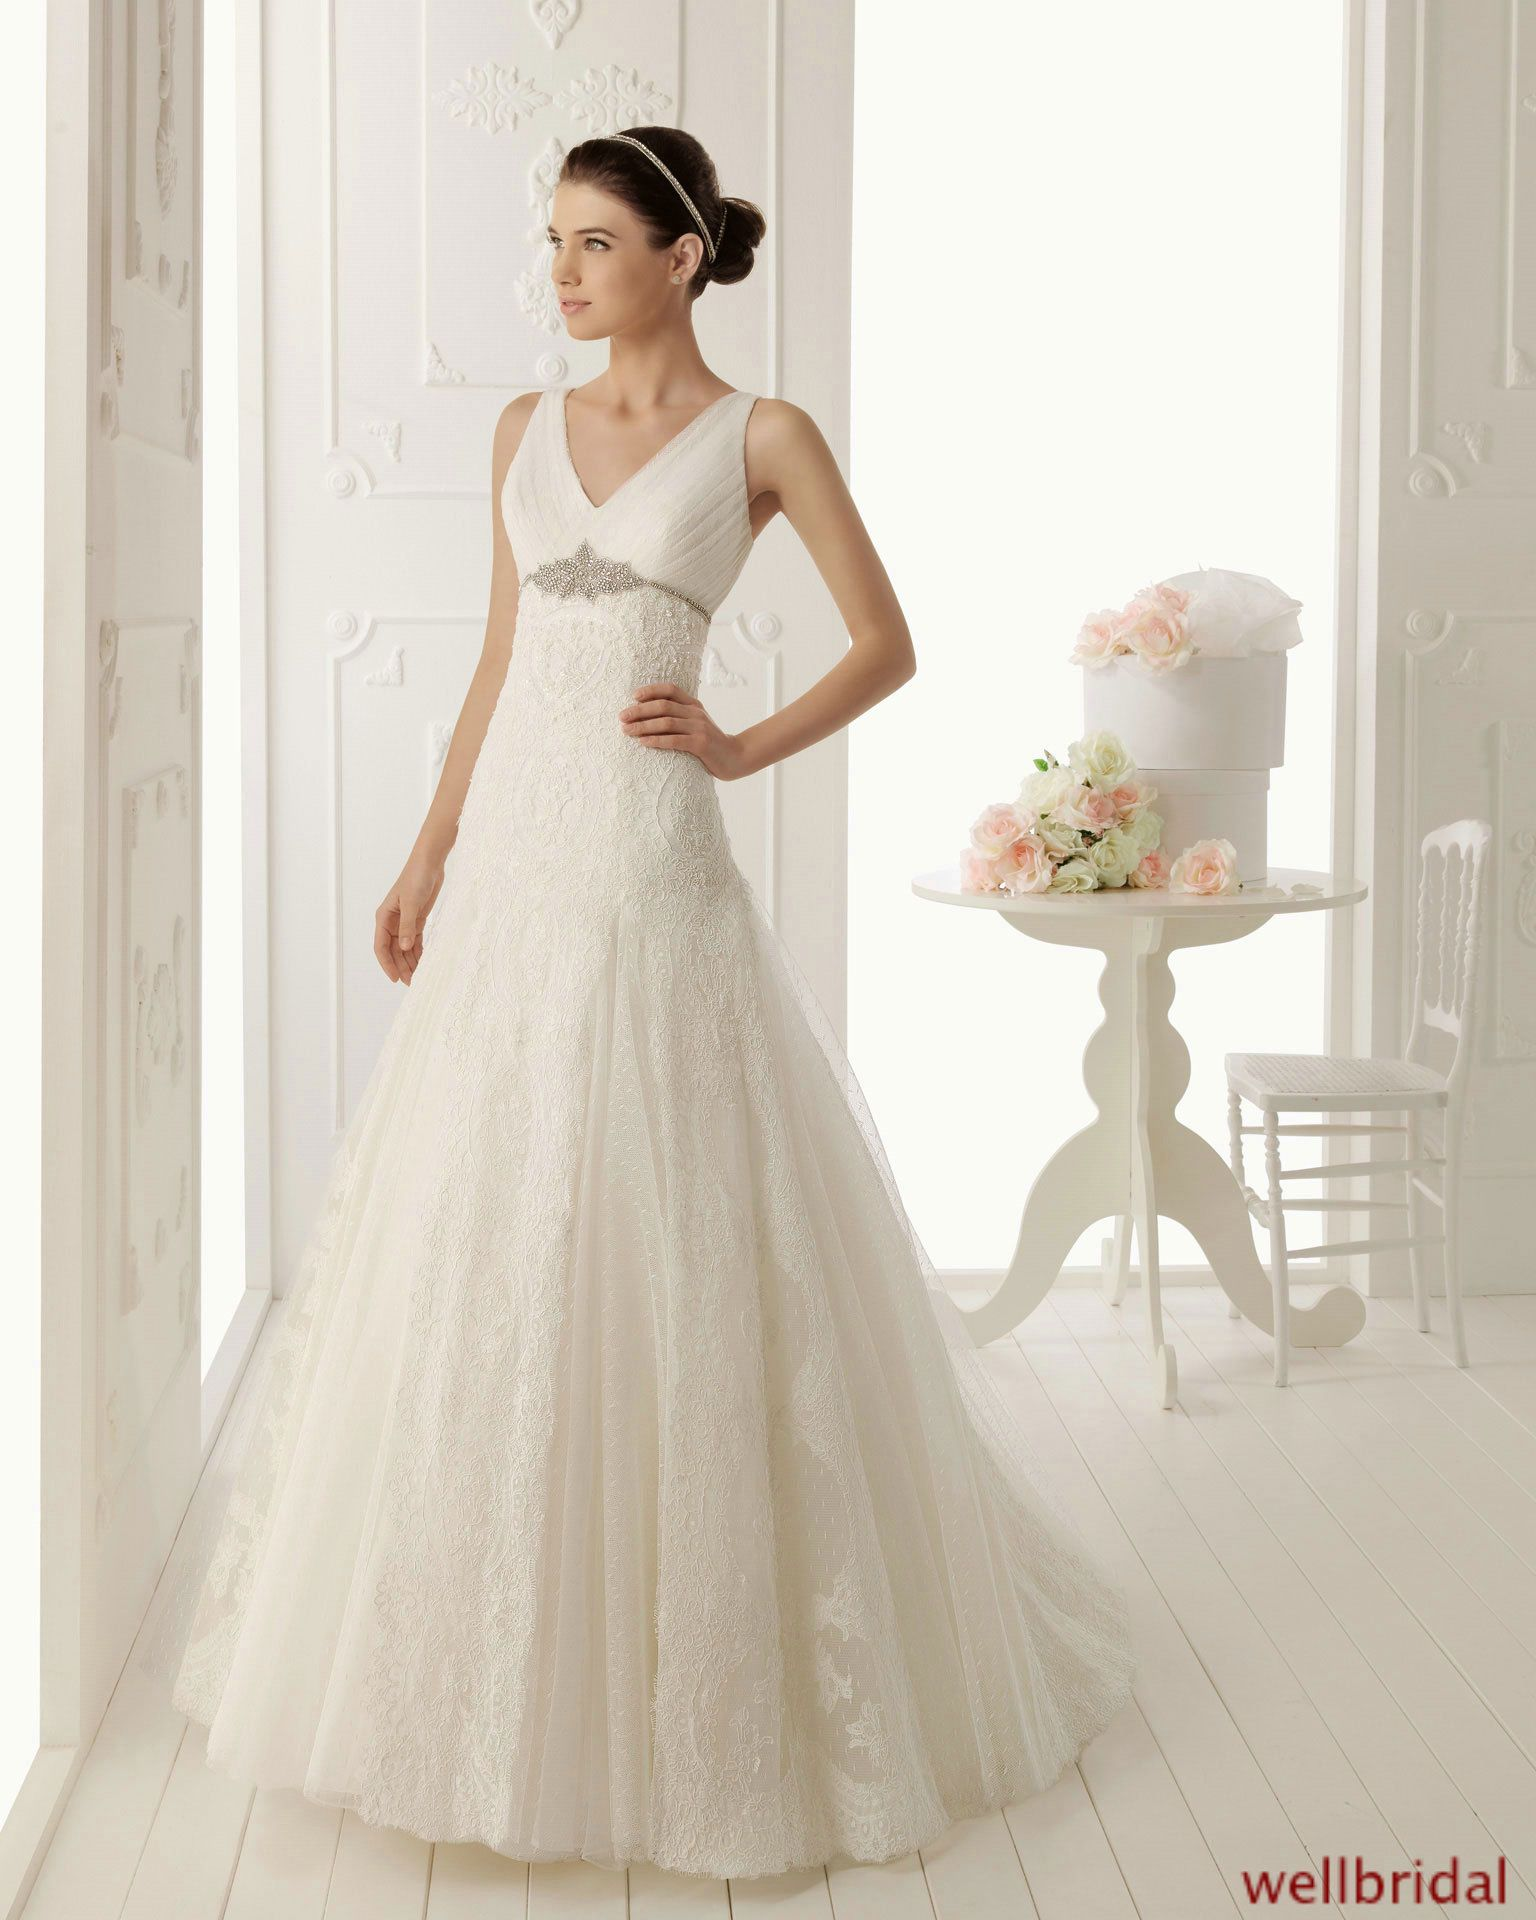 17 Best images about Casamento on Pinterest | Wedding, Walkways ...